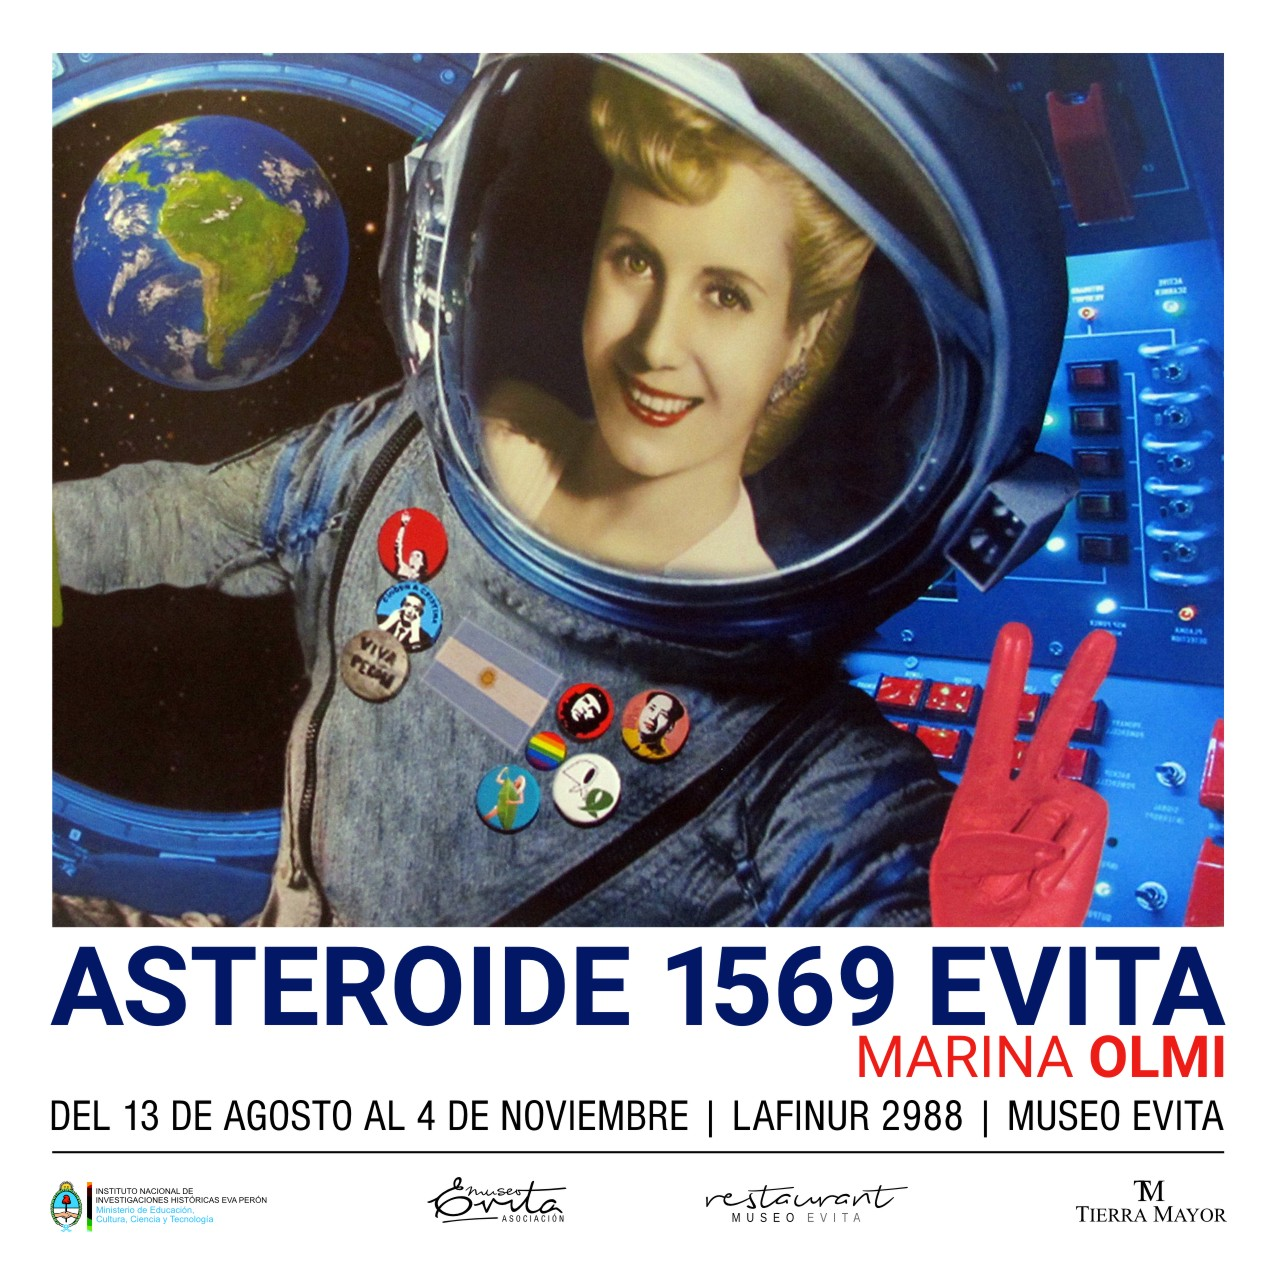 Continúa Asteroide 1569. Evita. Marina Olmi.